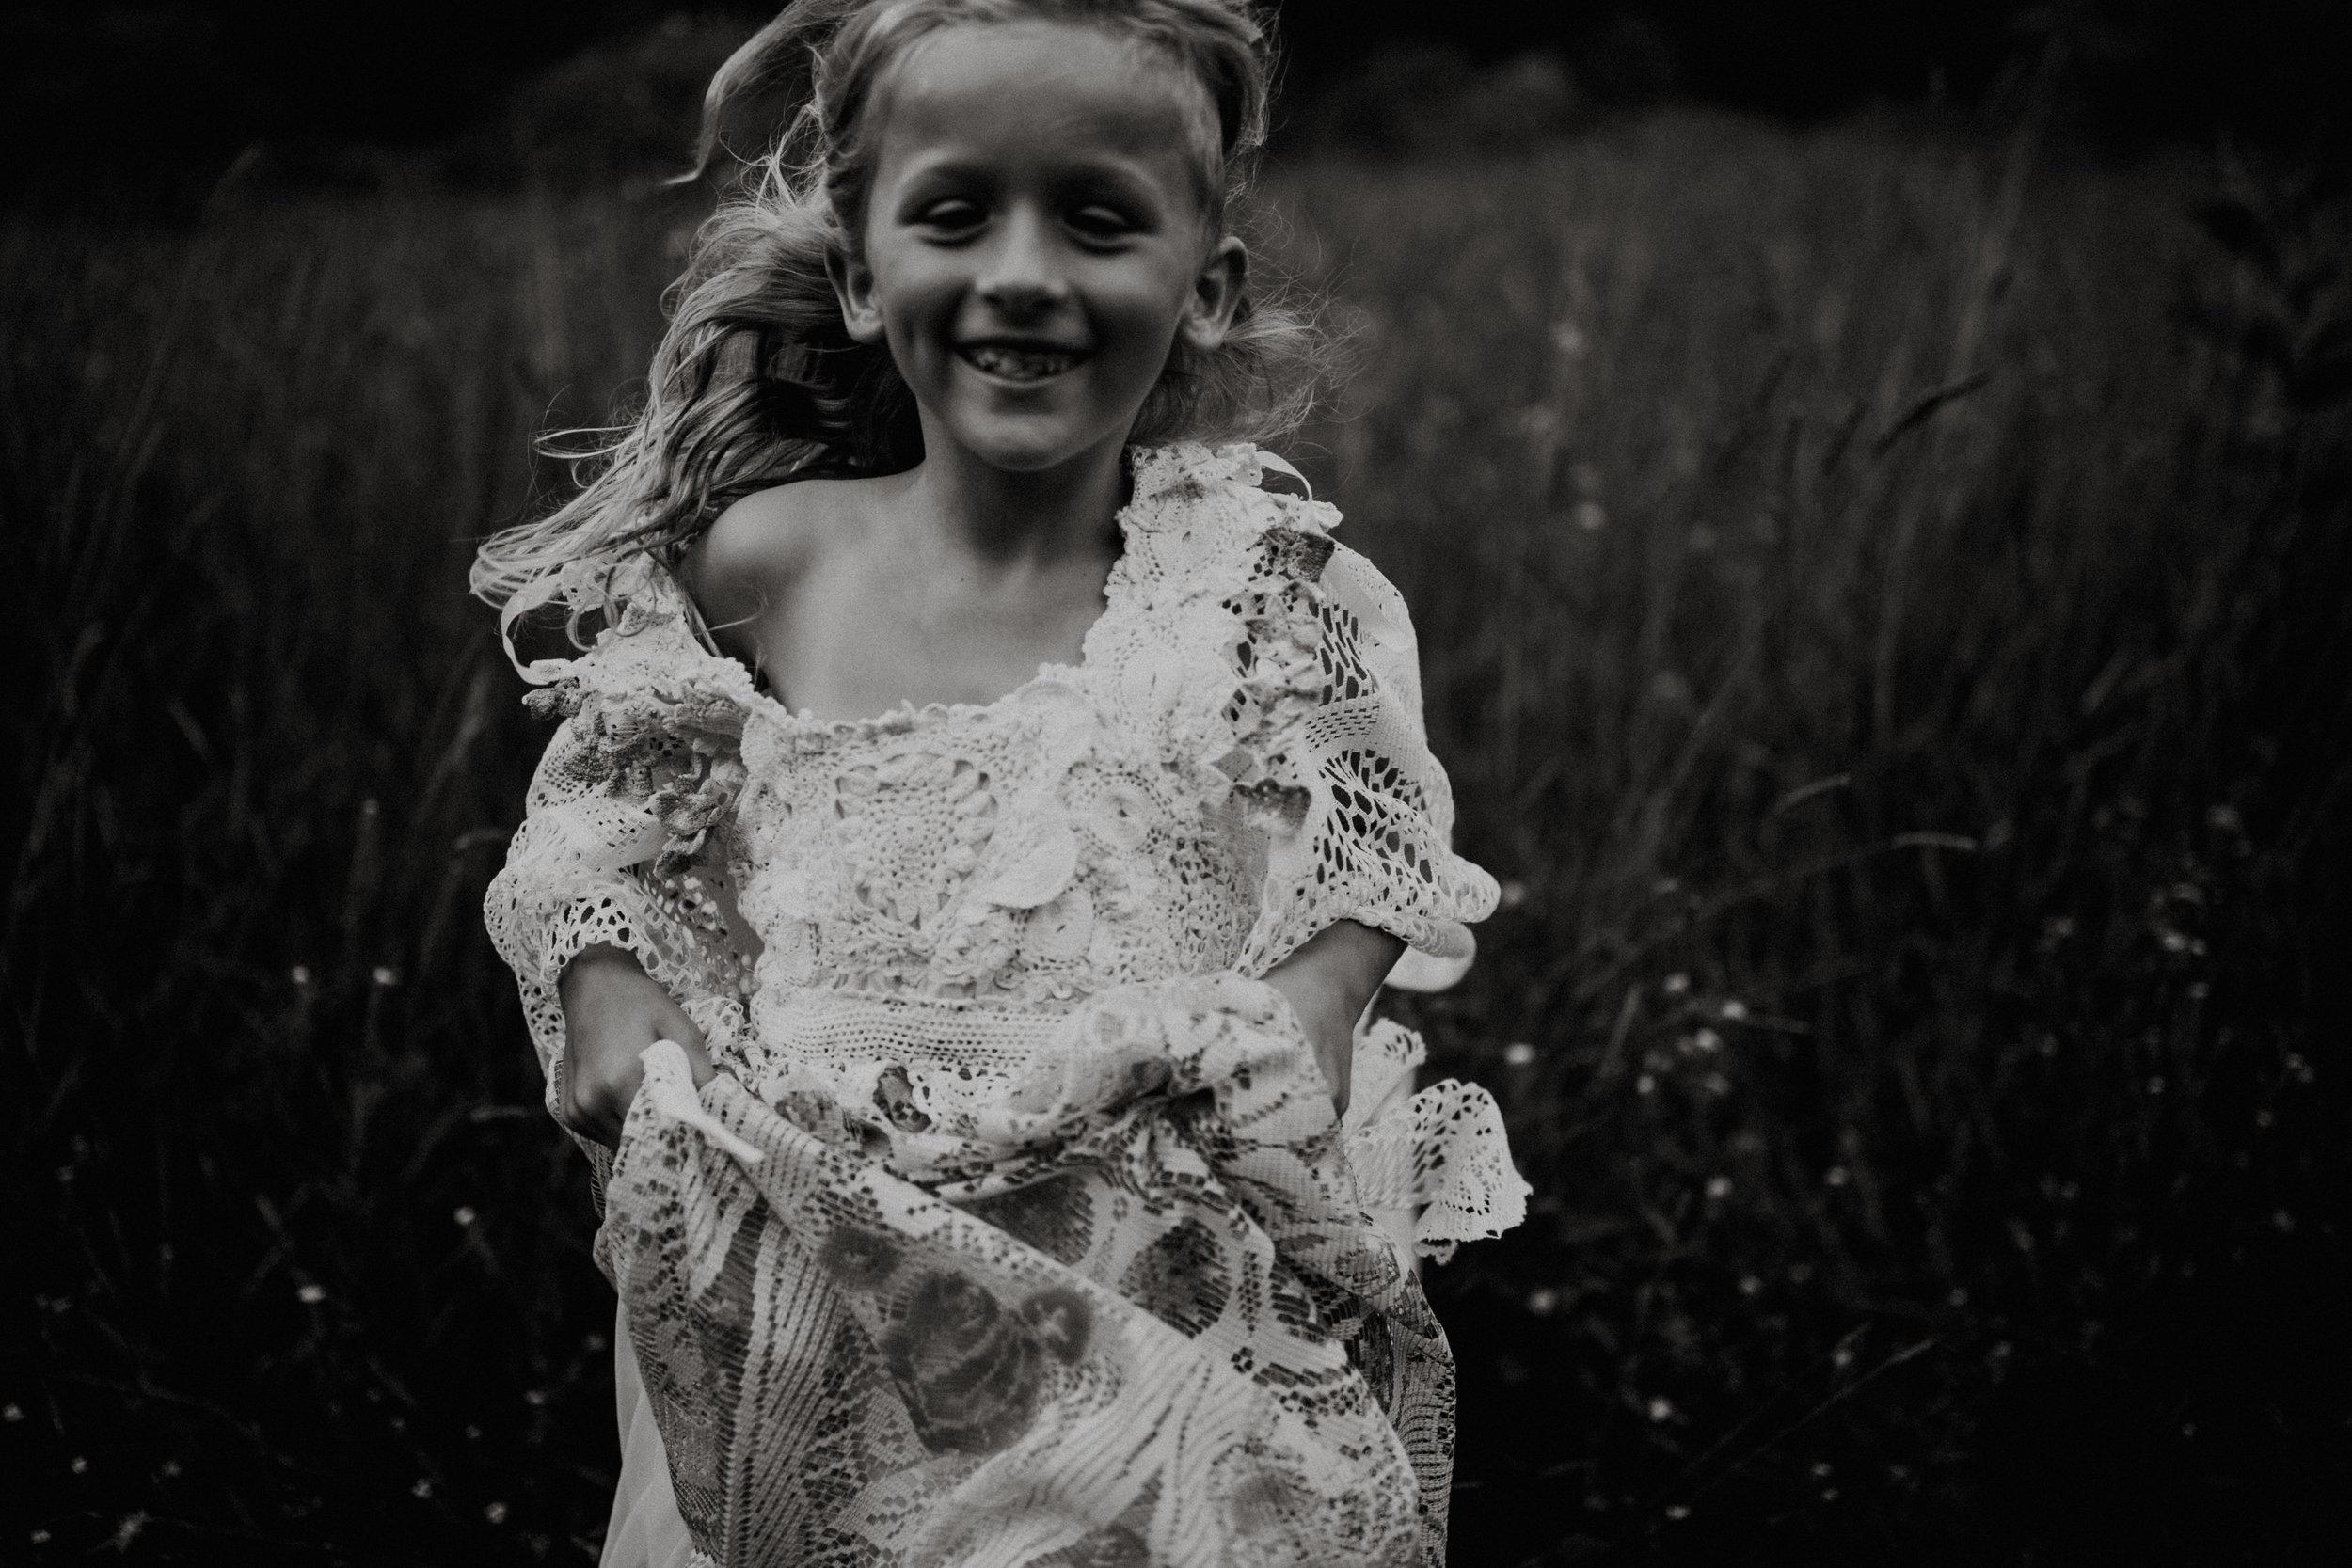 michigan-storytelling-photographer-jessica-max-reclamation-91.jpg